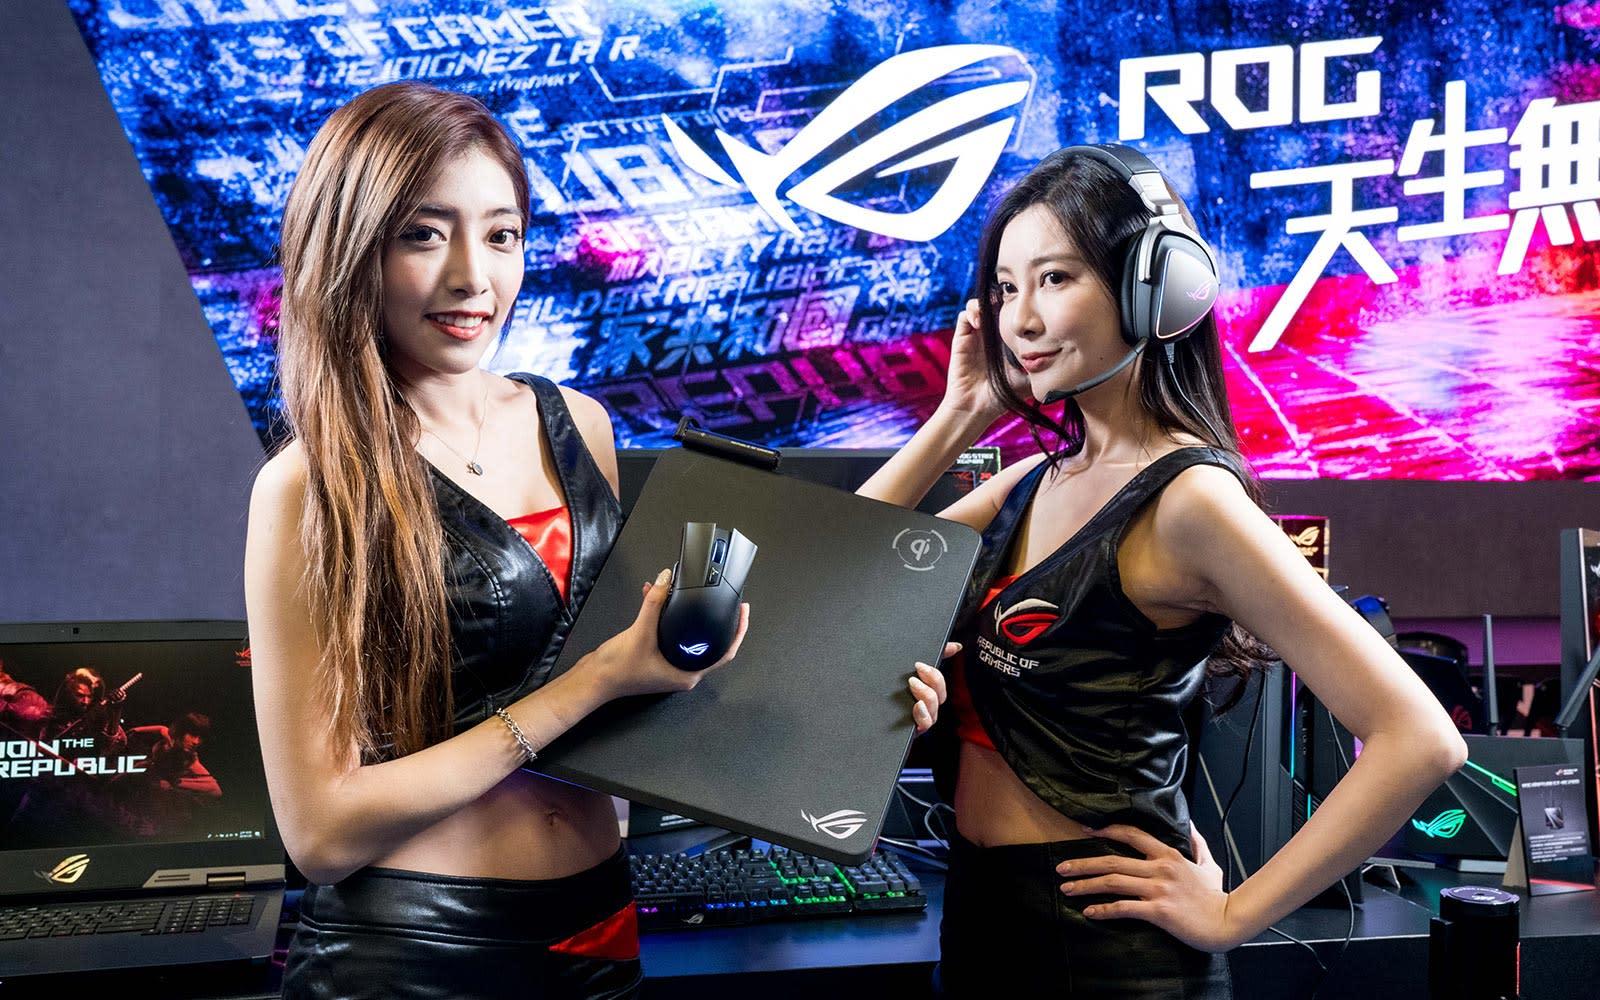 ASUS ROG Gladius II wireless mouse, ROG Balteus Qi mat and ROG Delta Core headphones